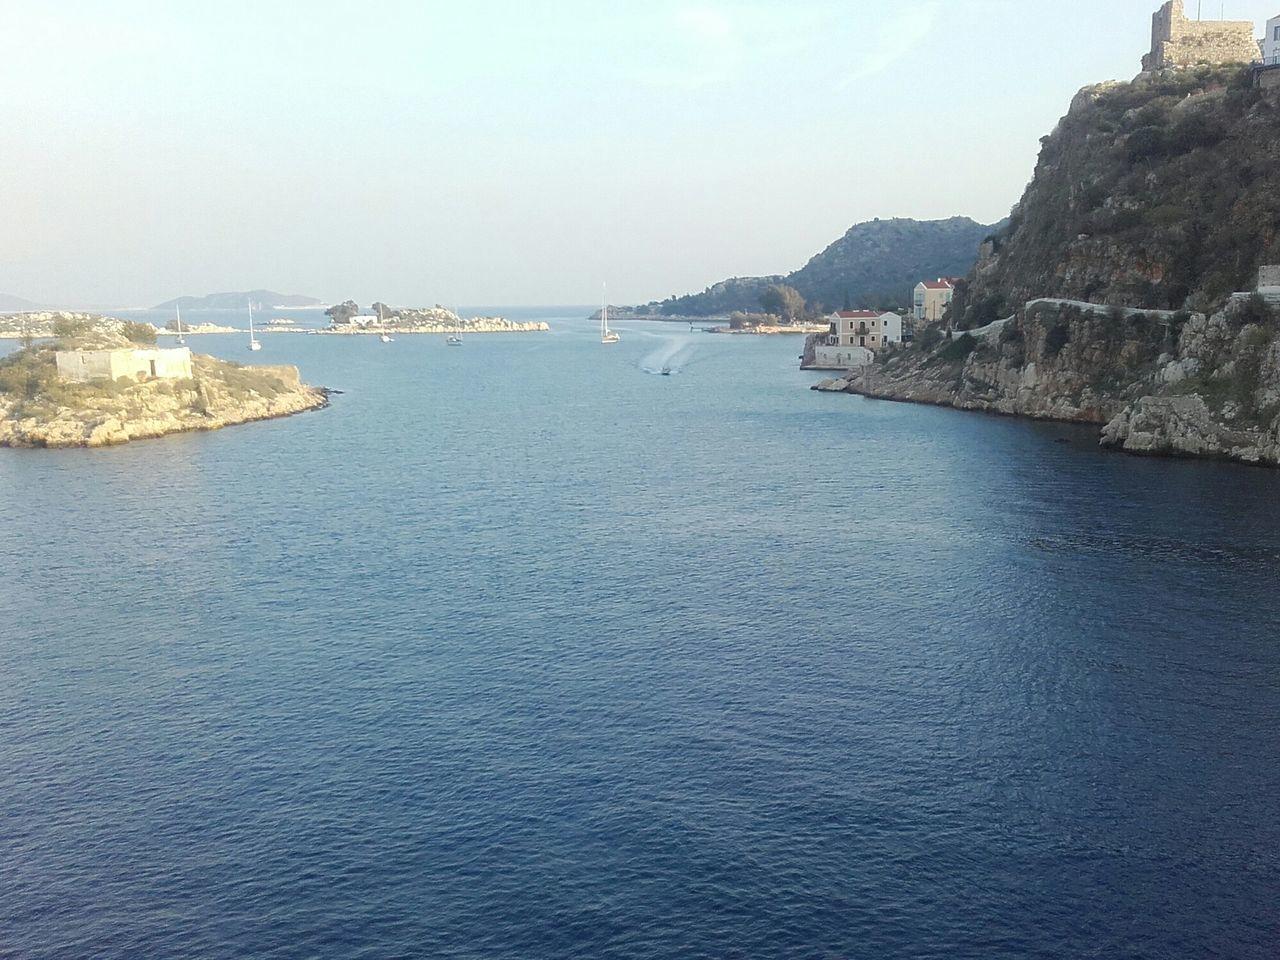 Kastellorizo Beautiful Island Enjoying Life 450 Inhabitants Taking Photos Greece